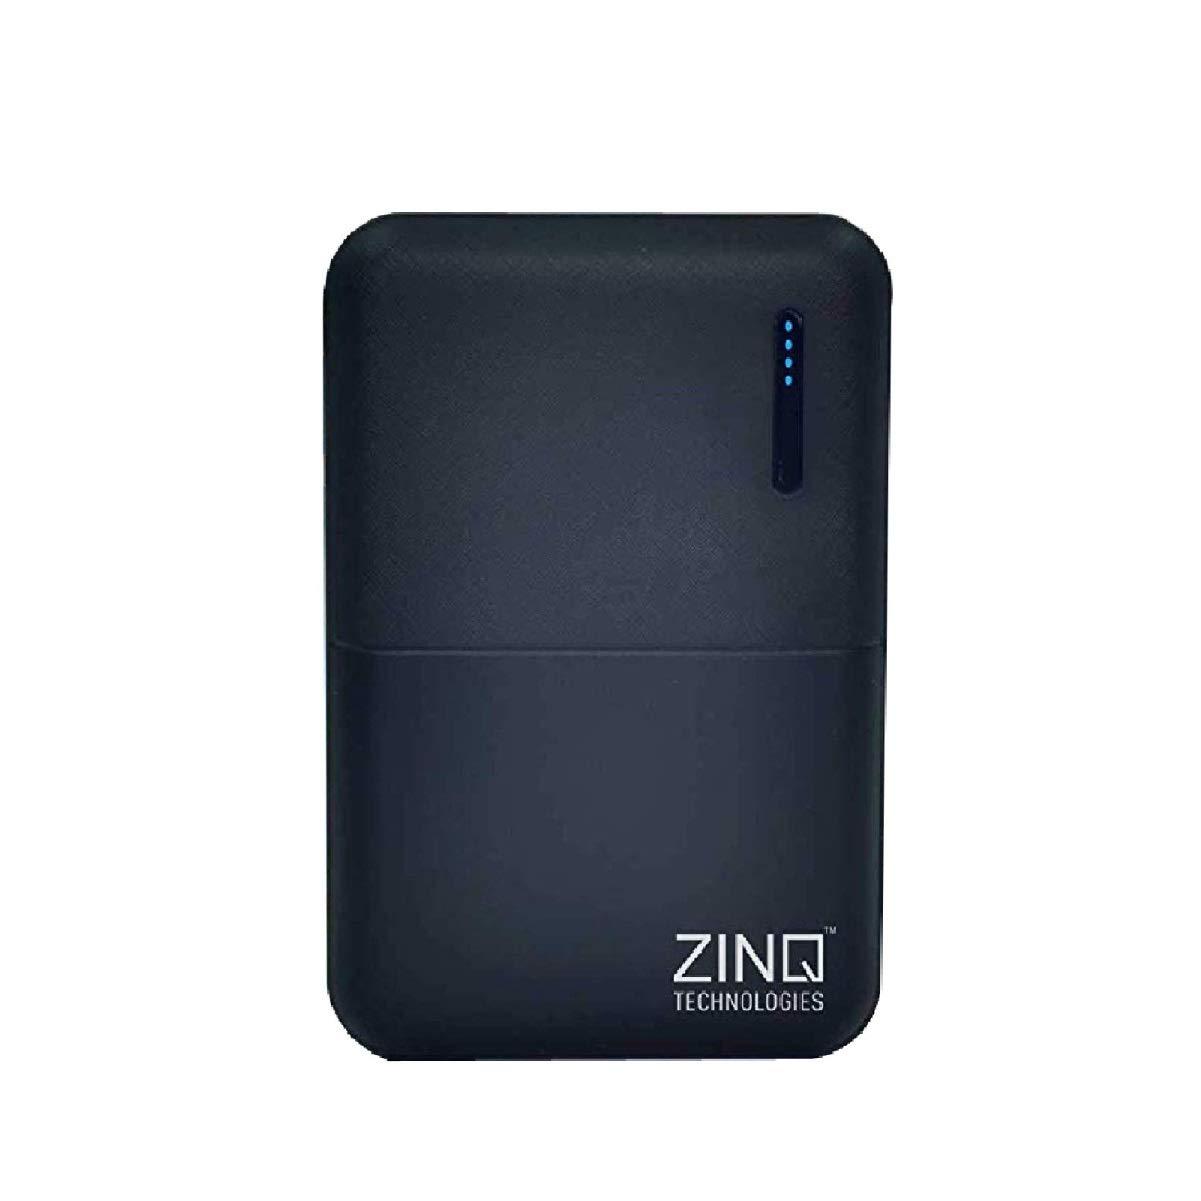 Zinq 10000mAh Li-Polymer Compact Power Bank